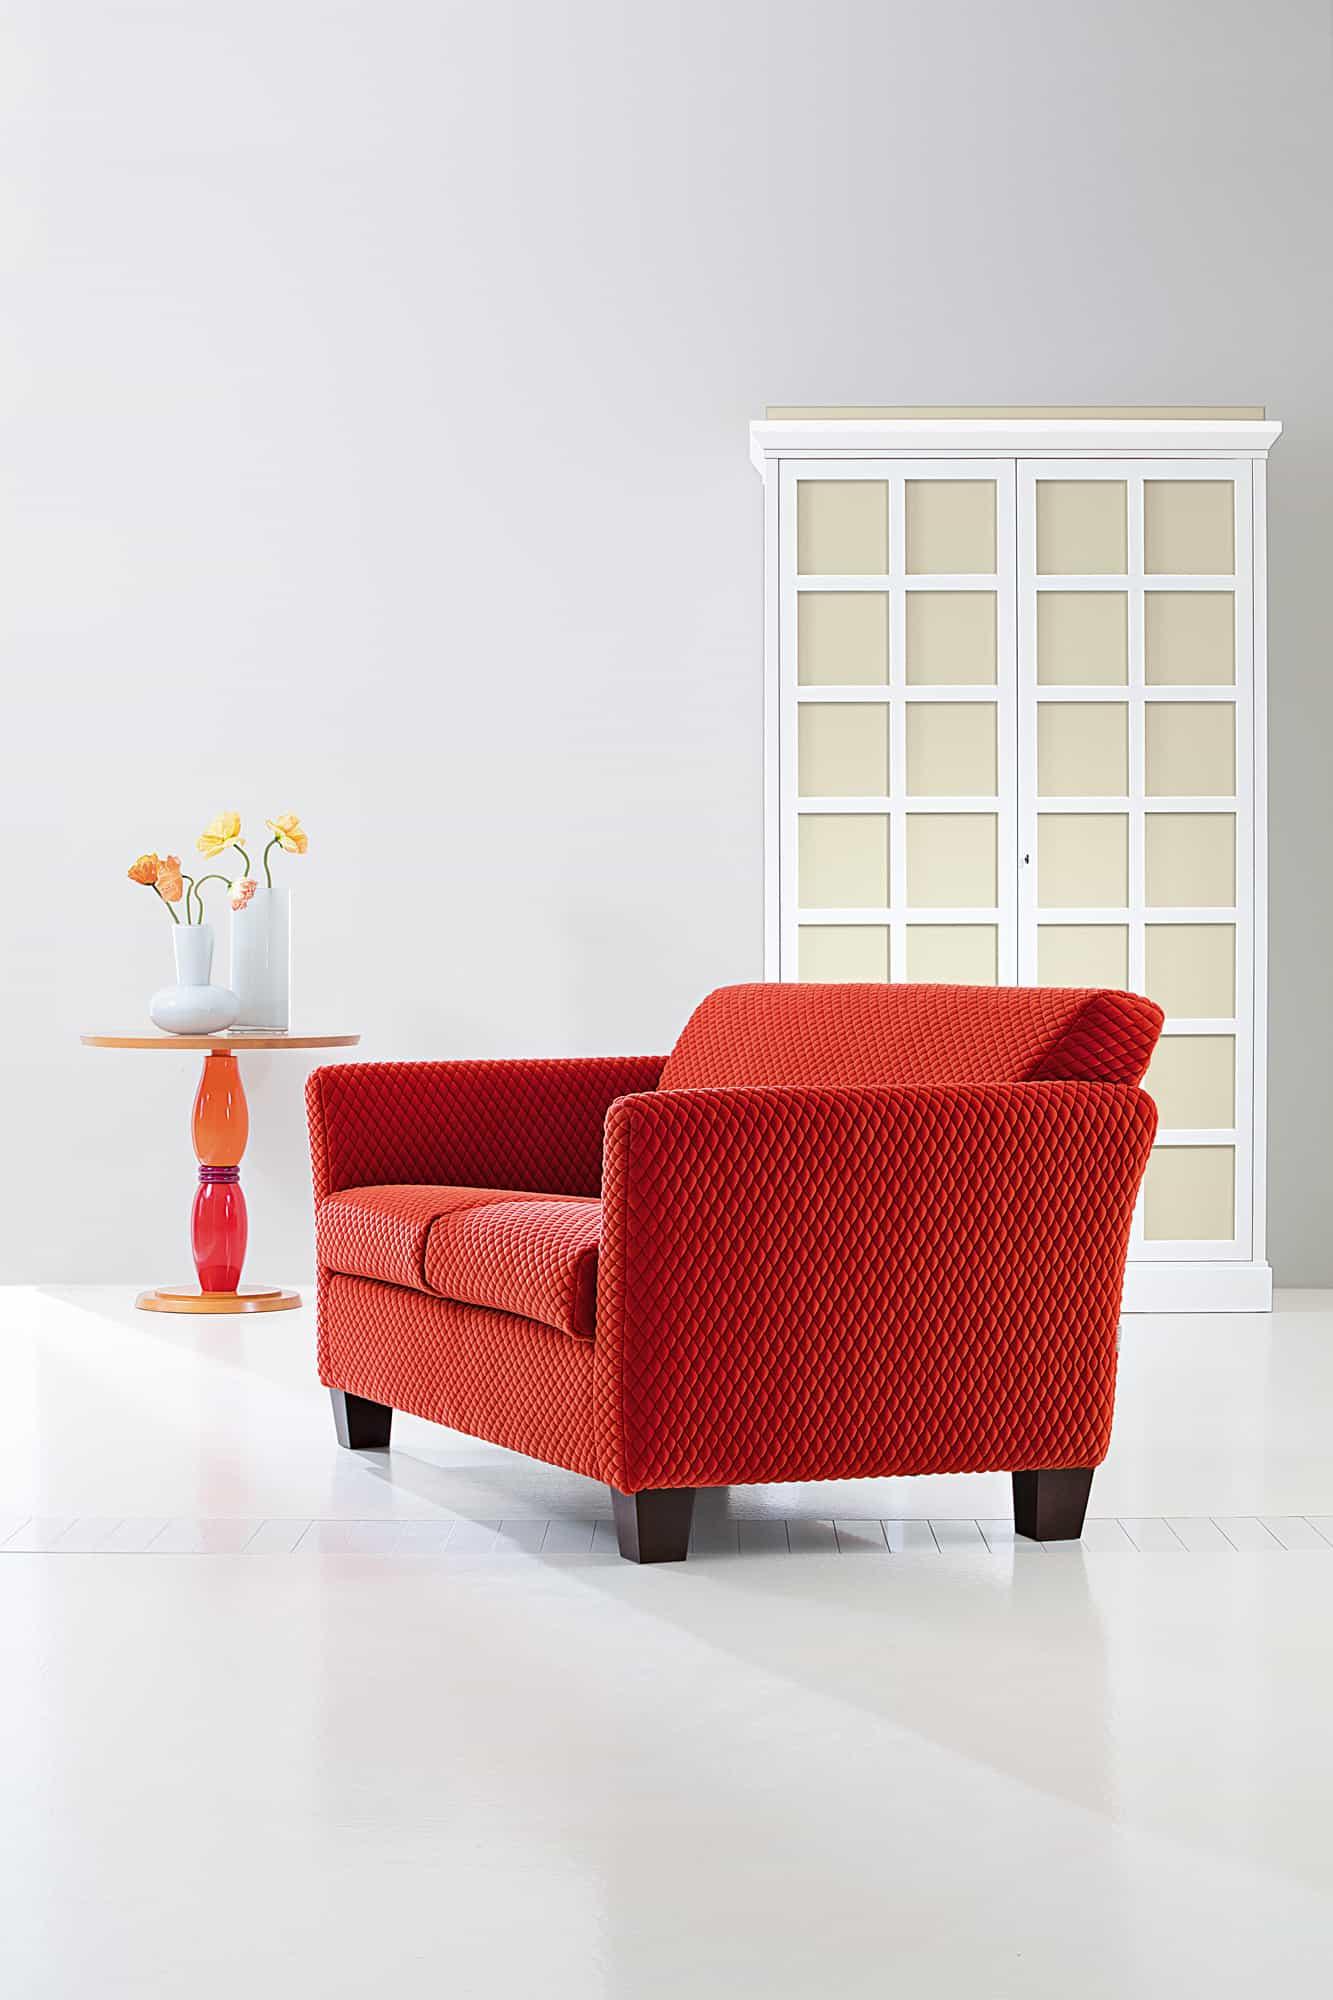 beistelltisch cose mobili birillone birillo marktex. Black Bedroom Furniture Sets. Home Design Ideas